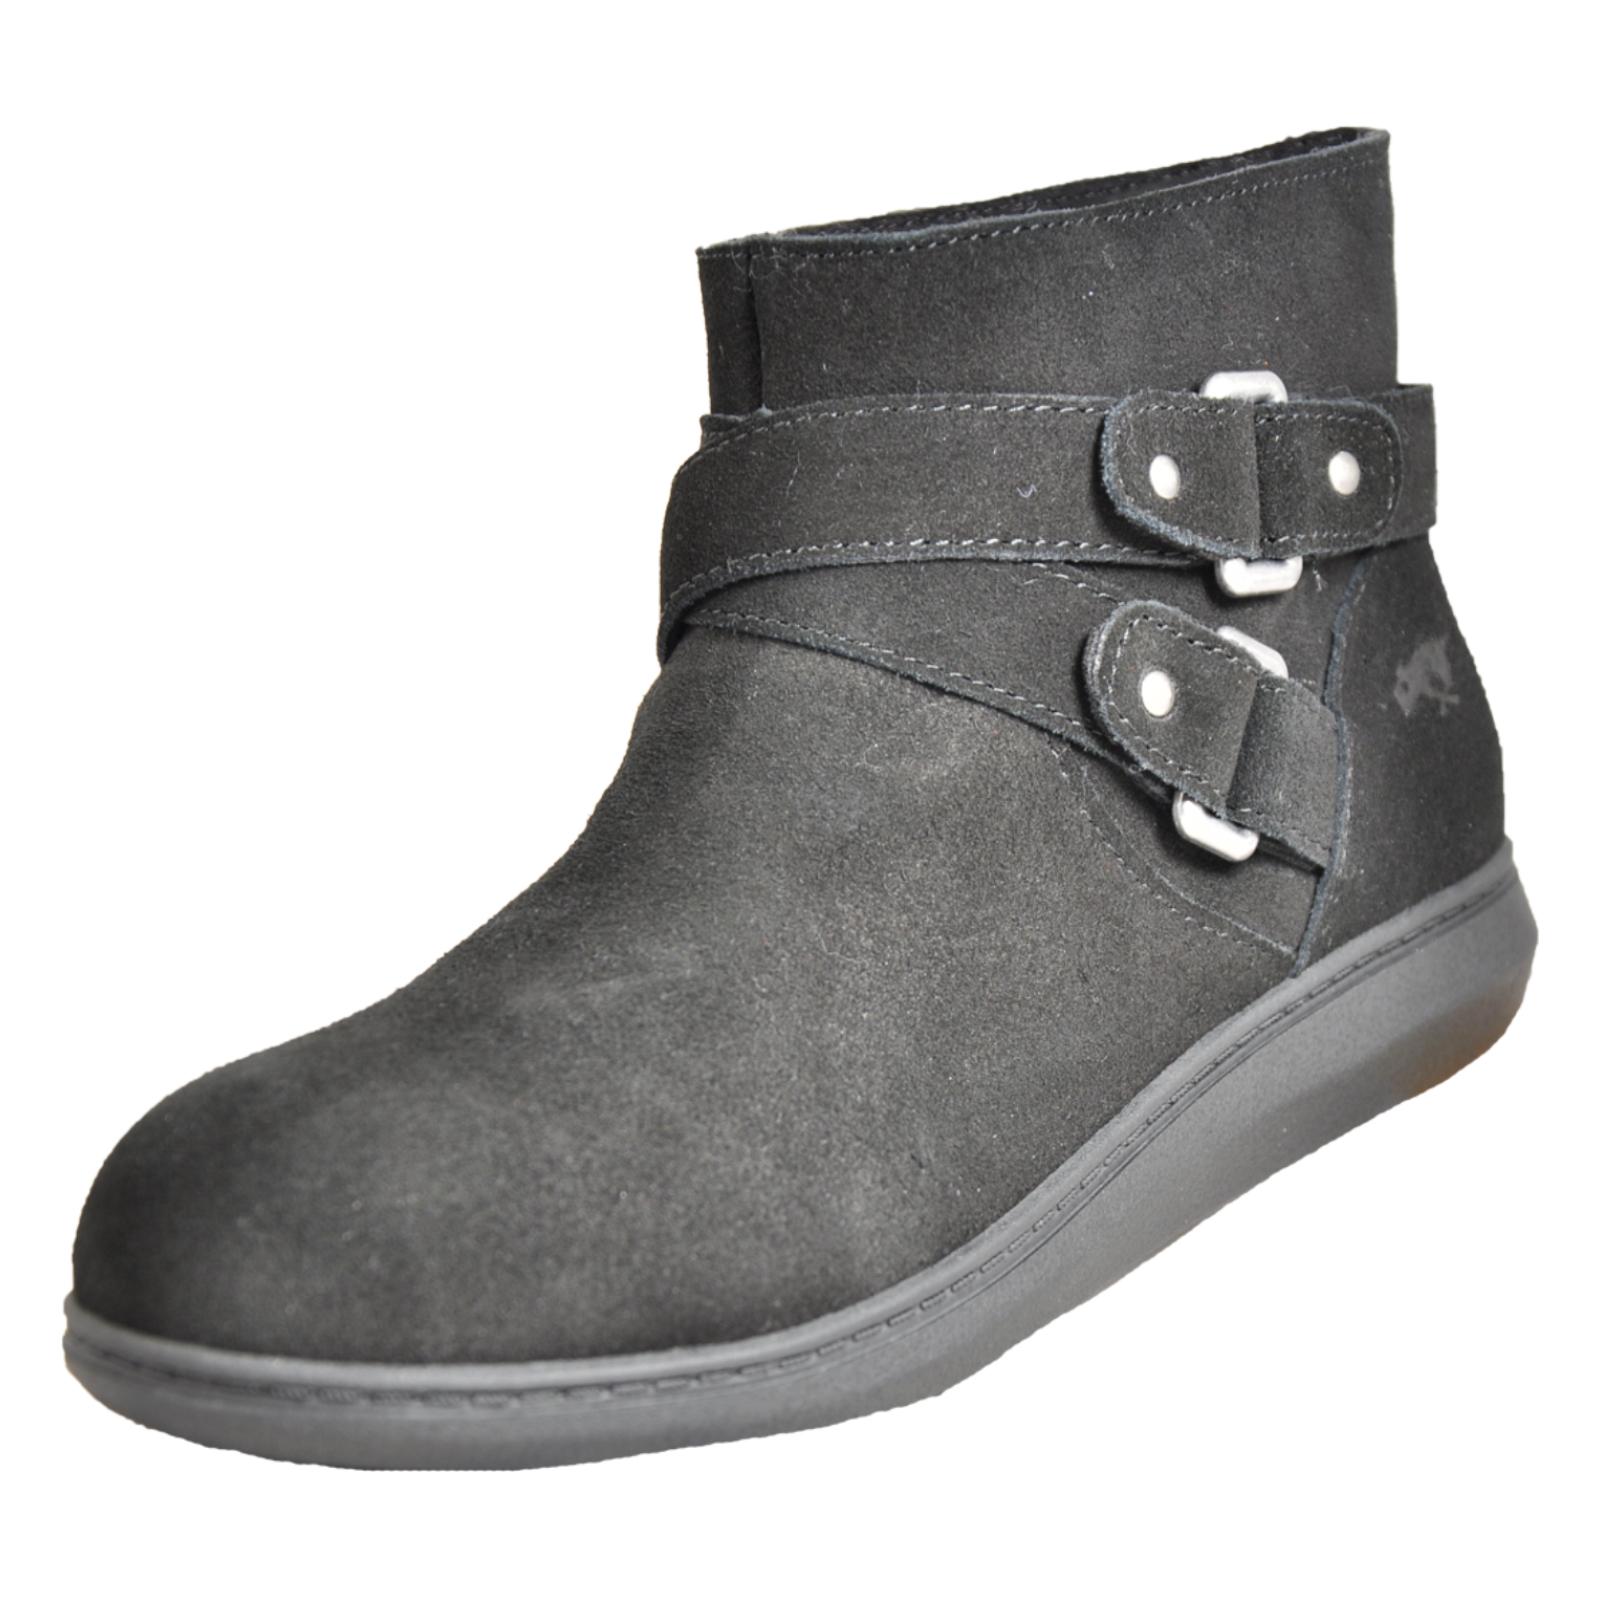 7180618c9fb47 Rocket Dog Manilla Women s Classic Formal Ankle Buckle Fashion Boot Black